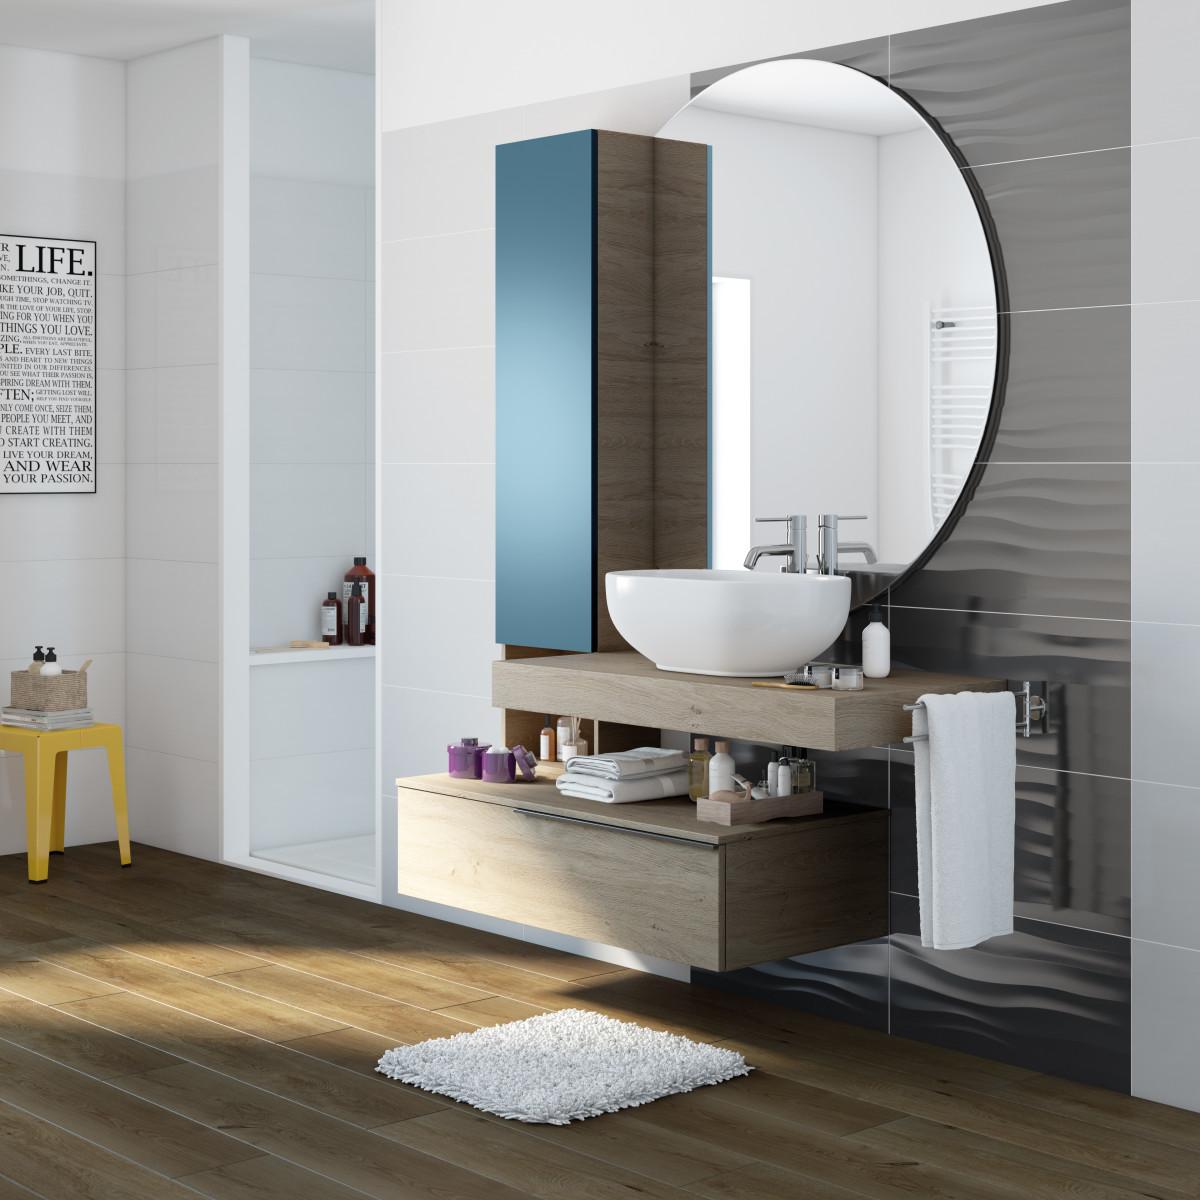 Bagno grigio perla - Leroy merlin mobili bagno ...